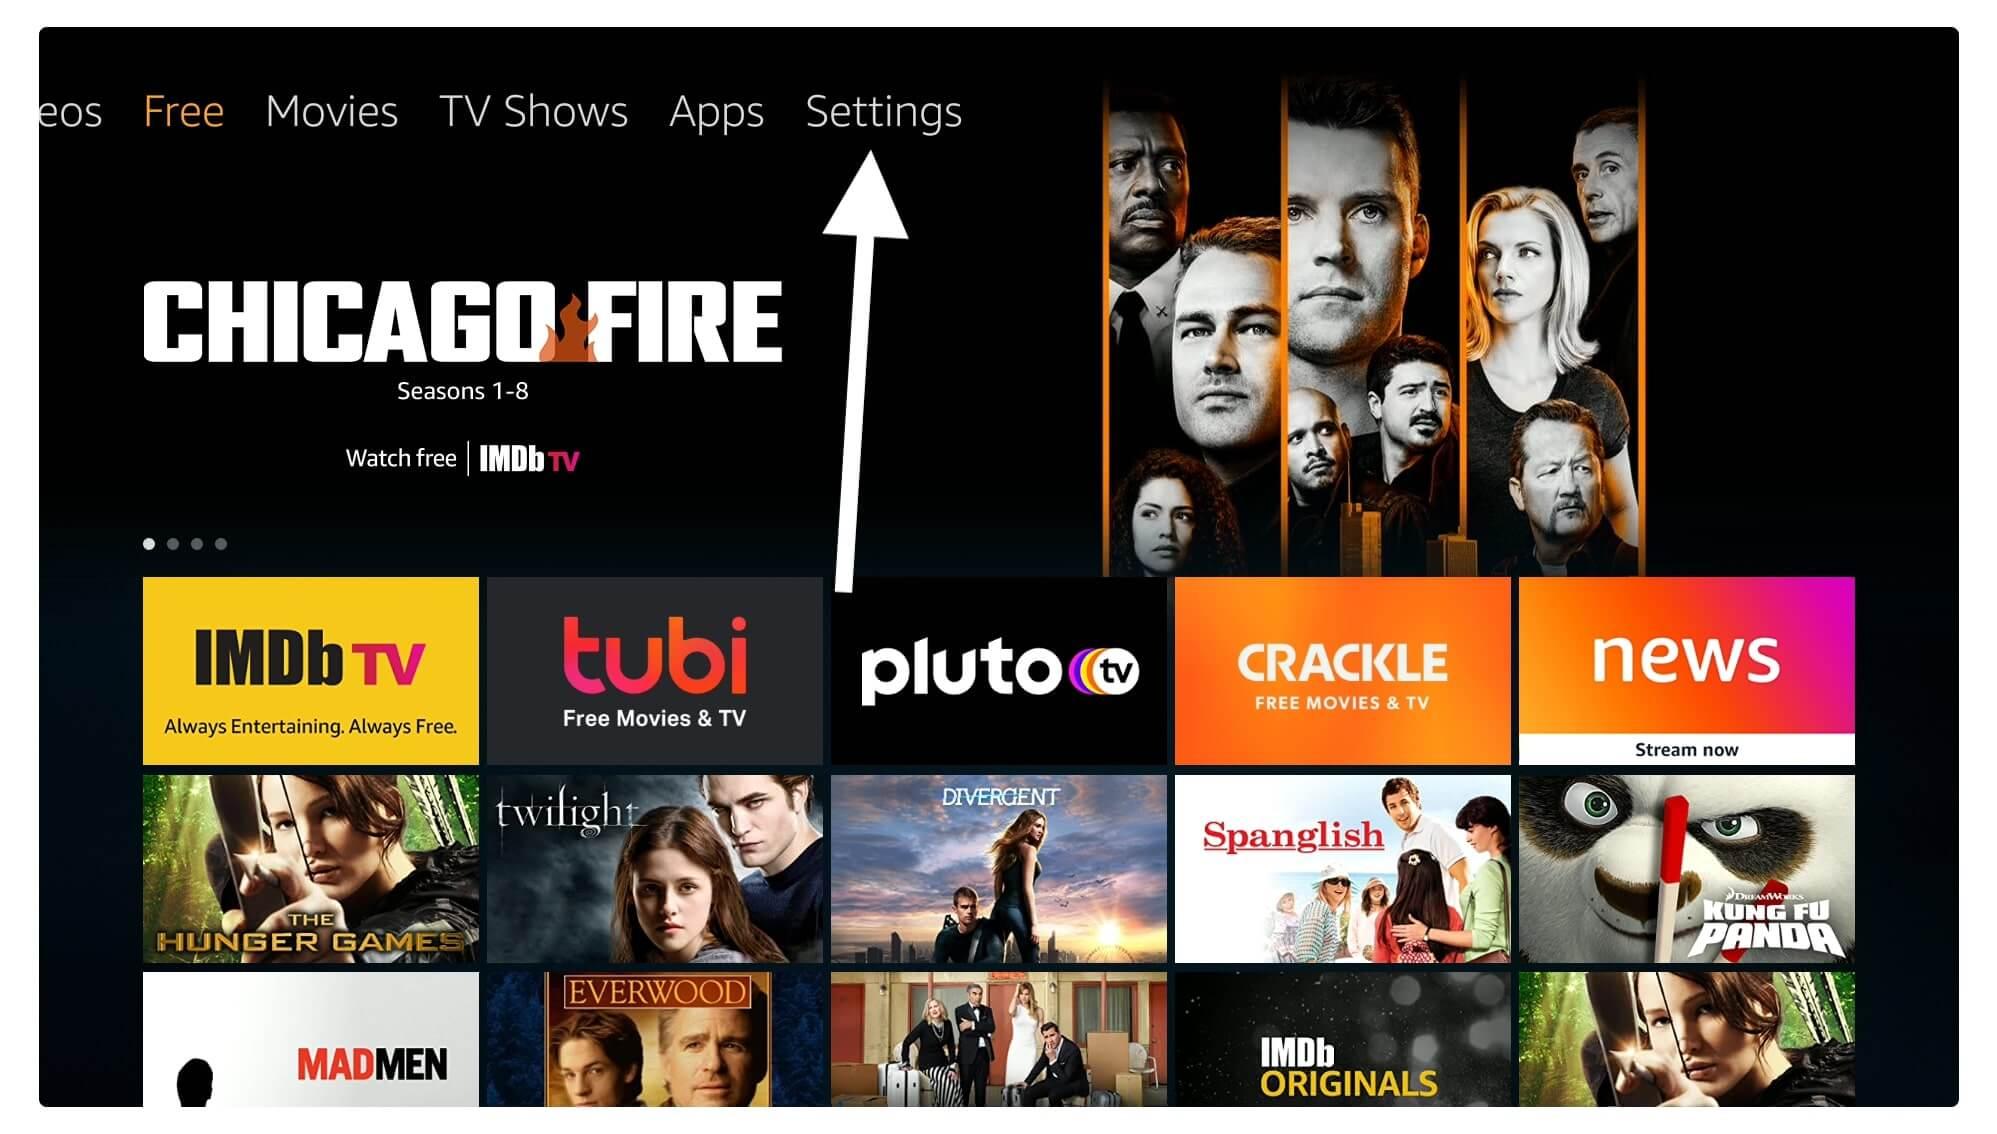 How-To-Setup-Wifi-On-Amazon-Firestick